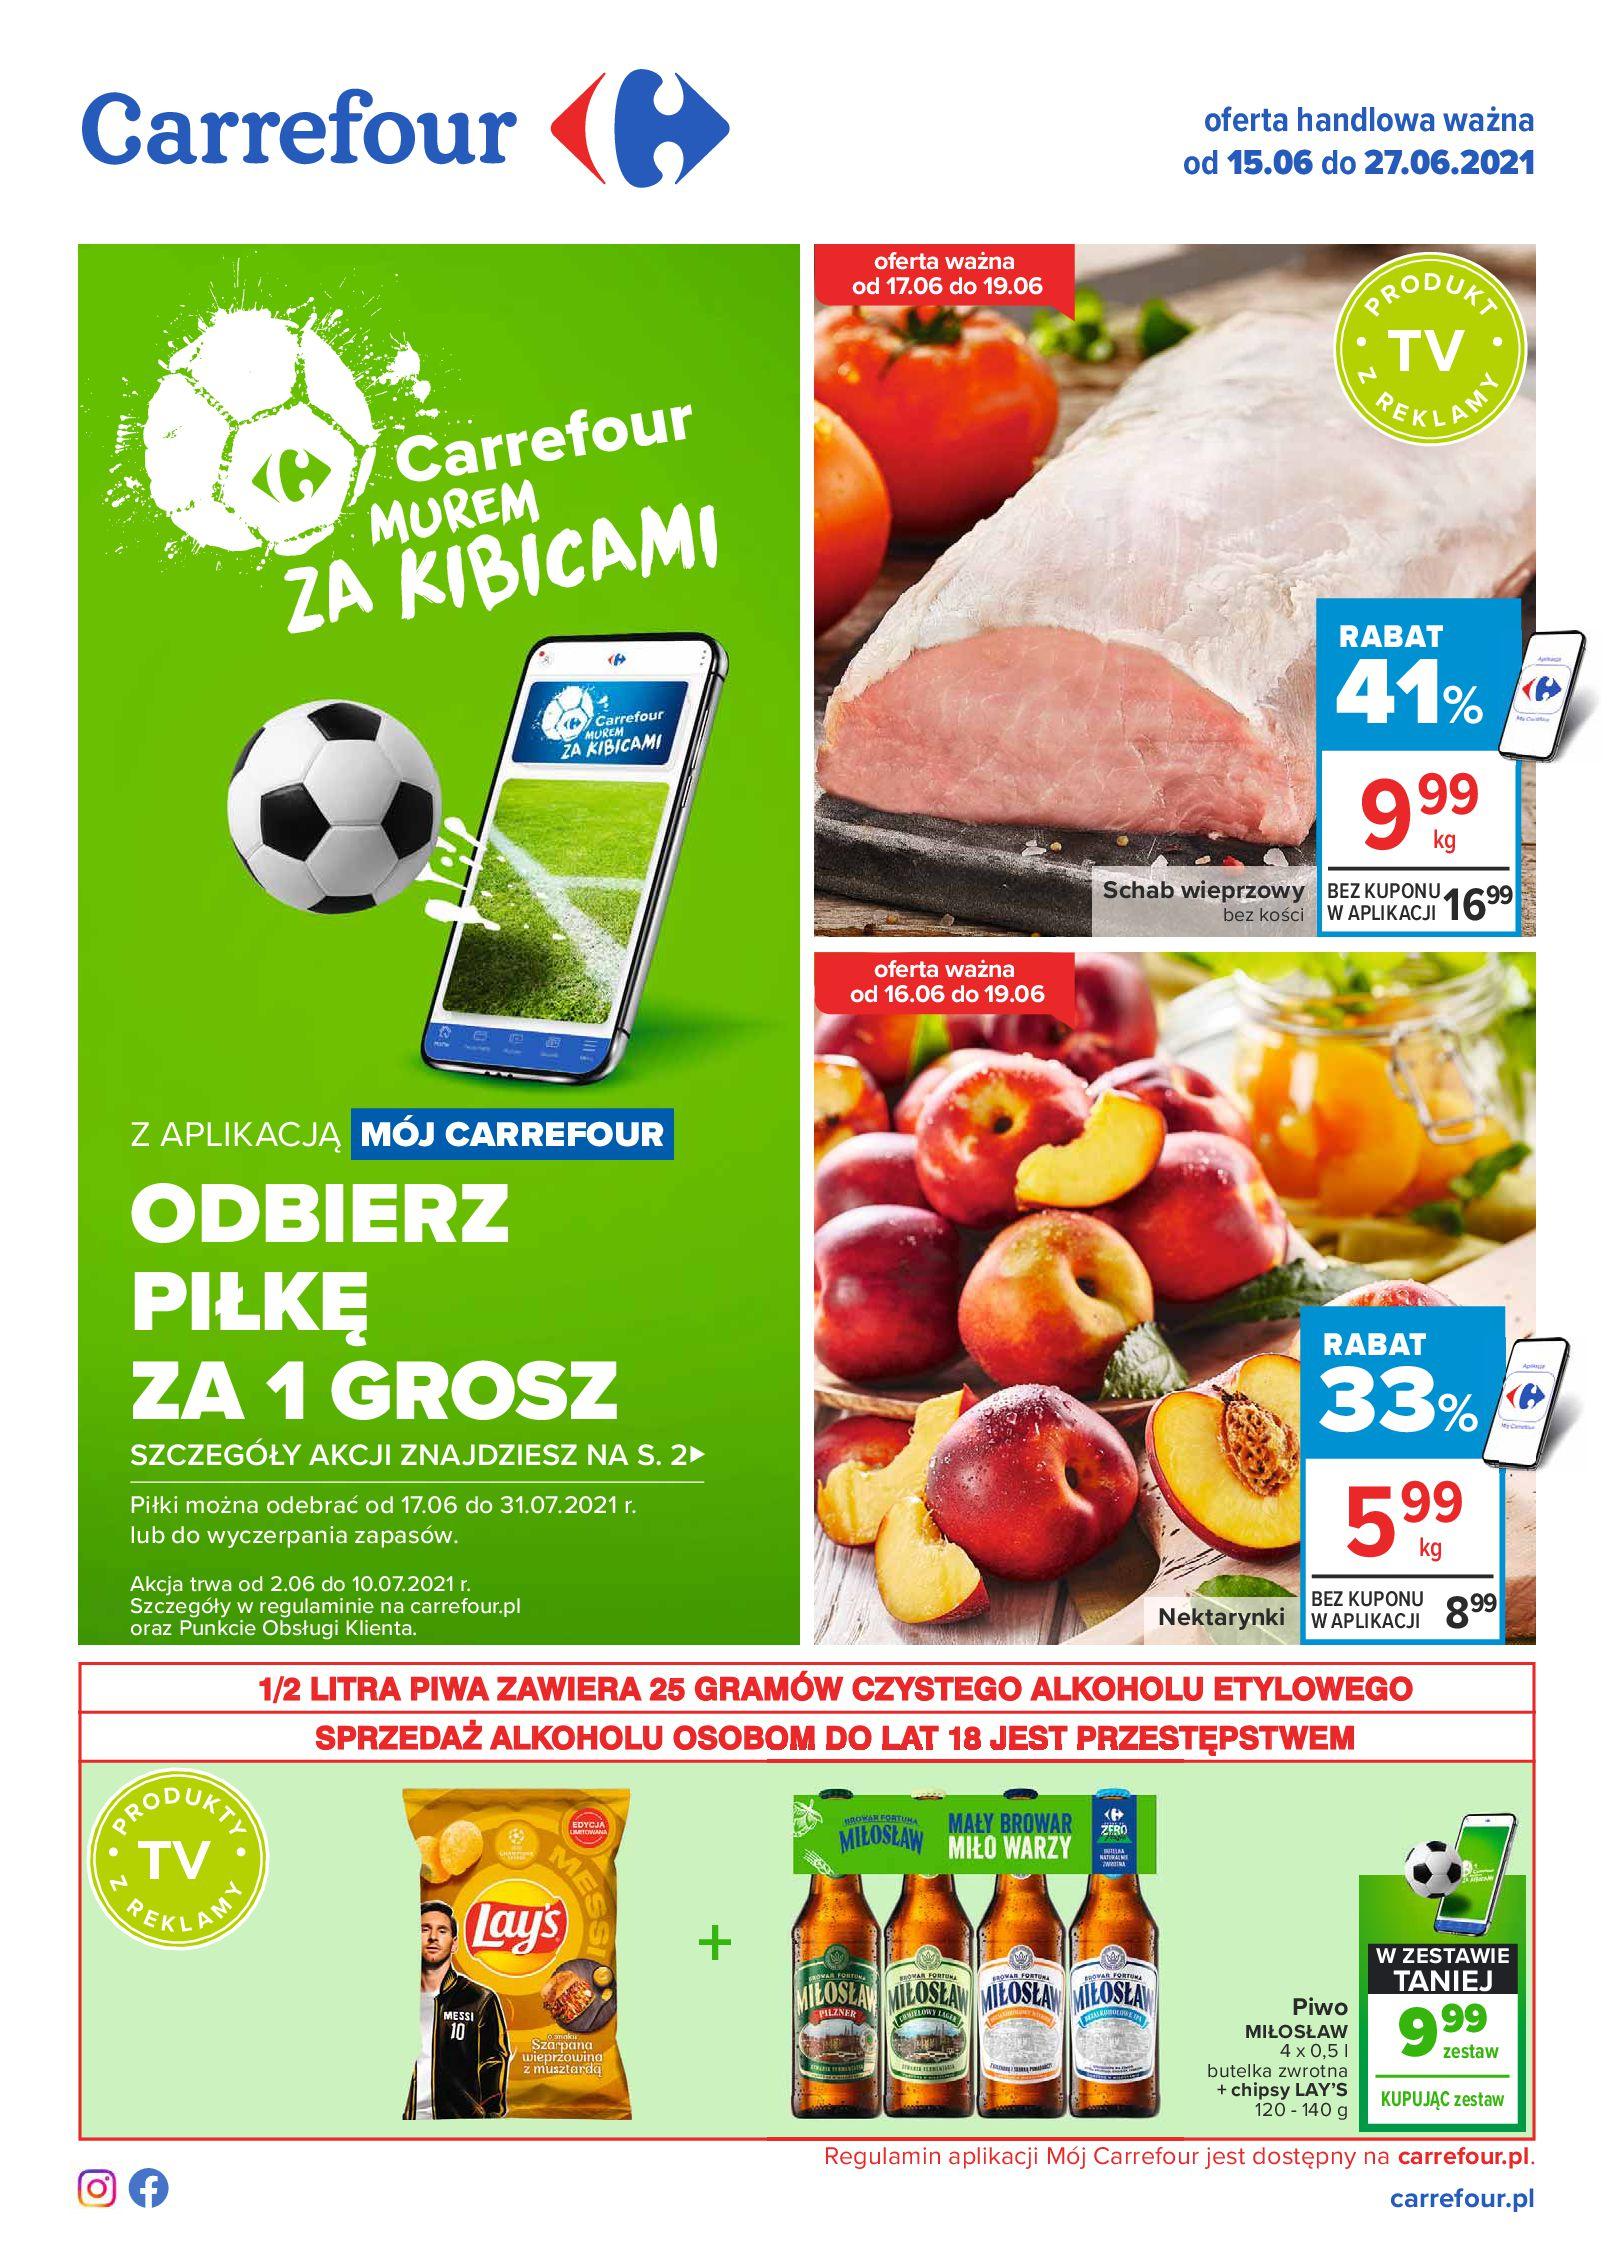 Carrefour:  Gazetka Carrefour - Oferta handlowa 14.06.2021